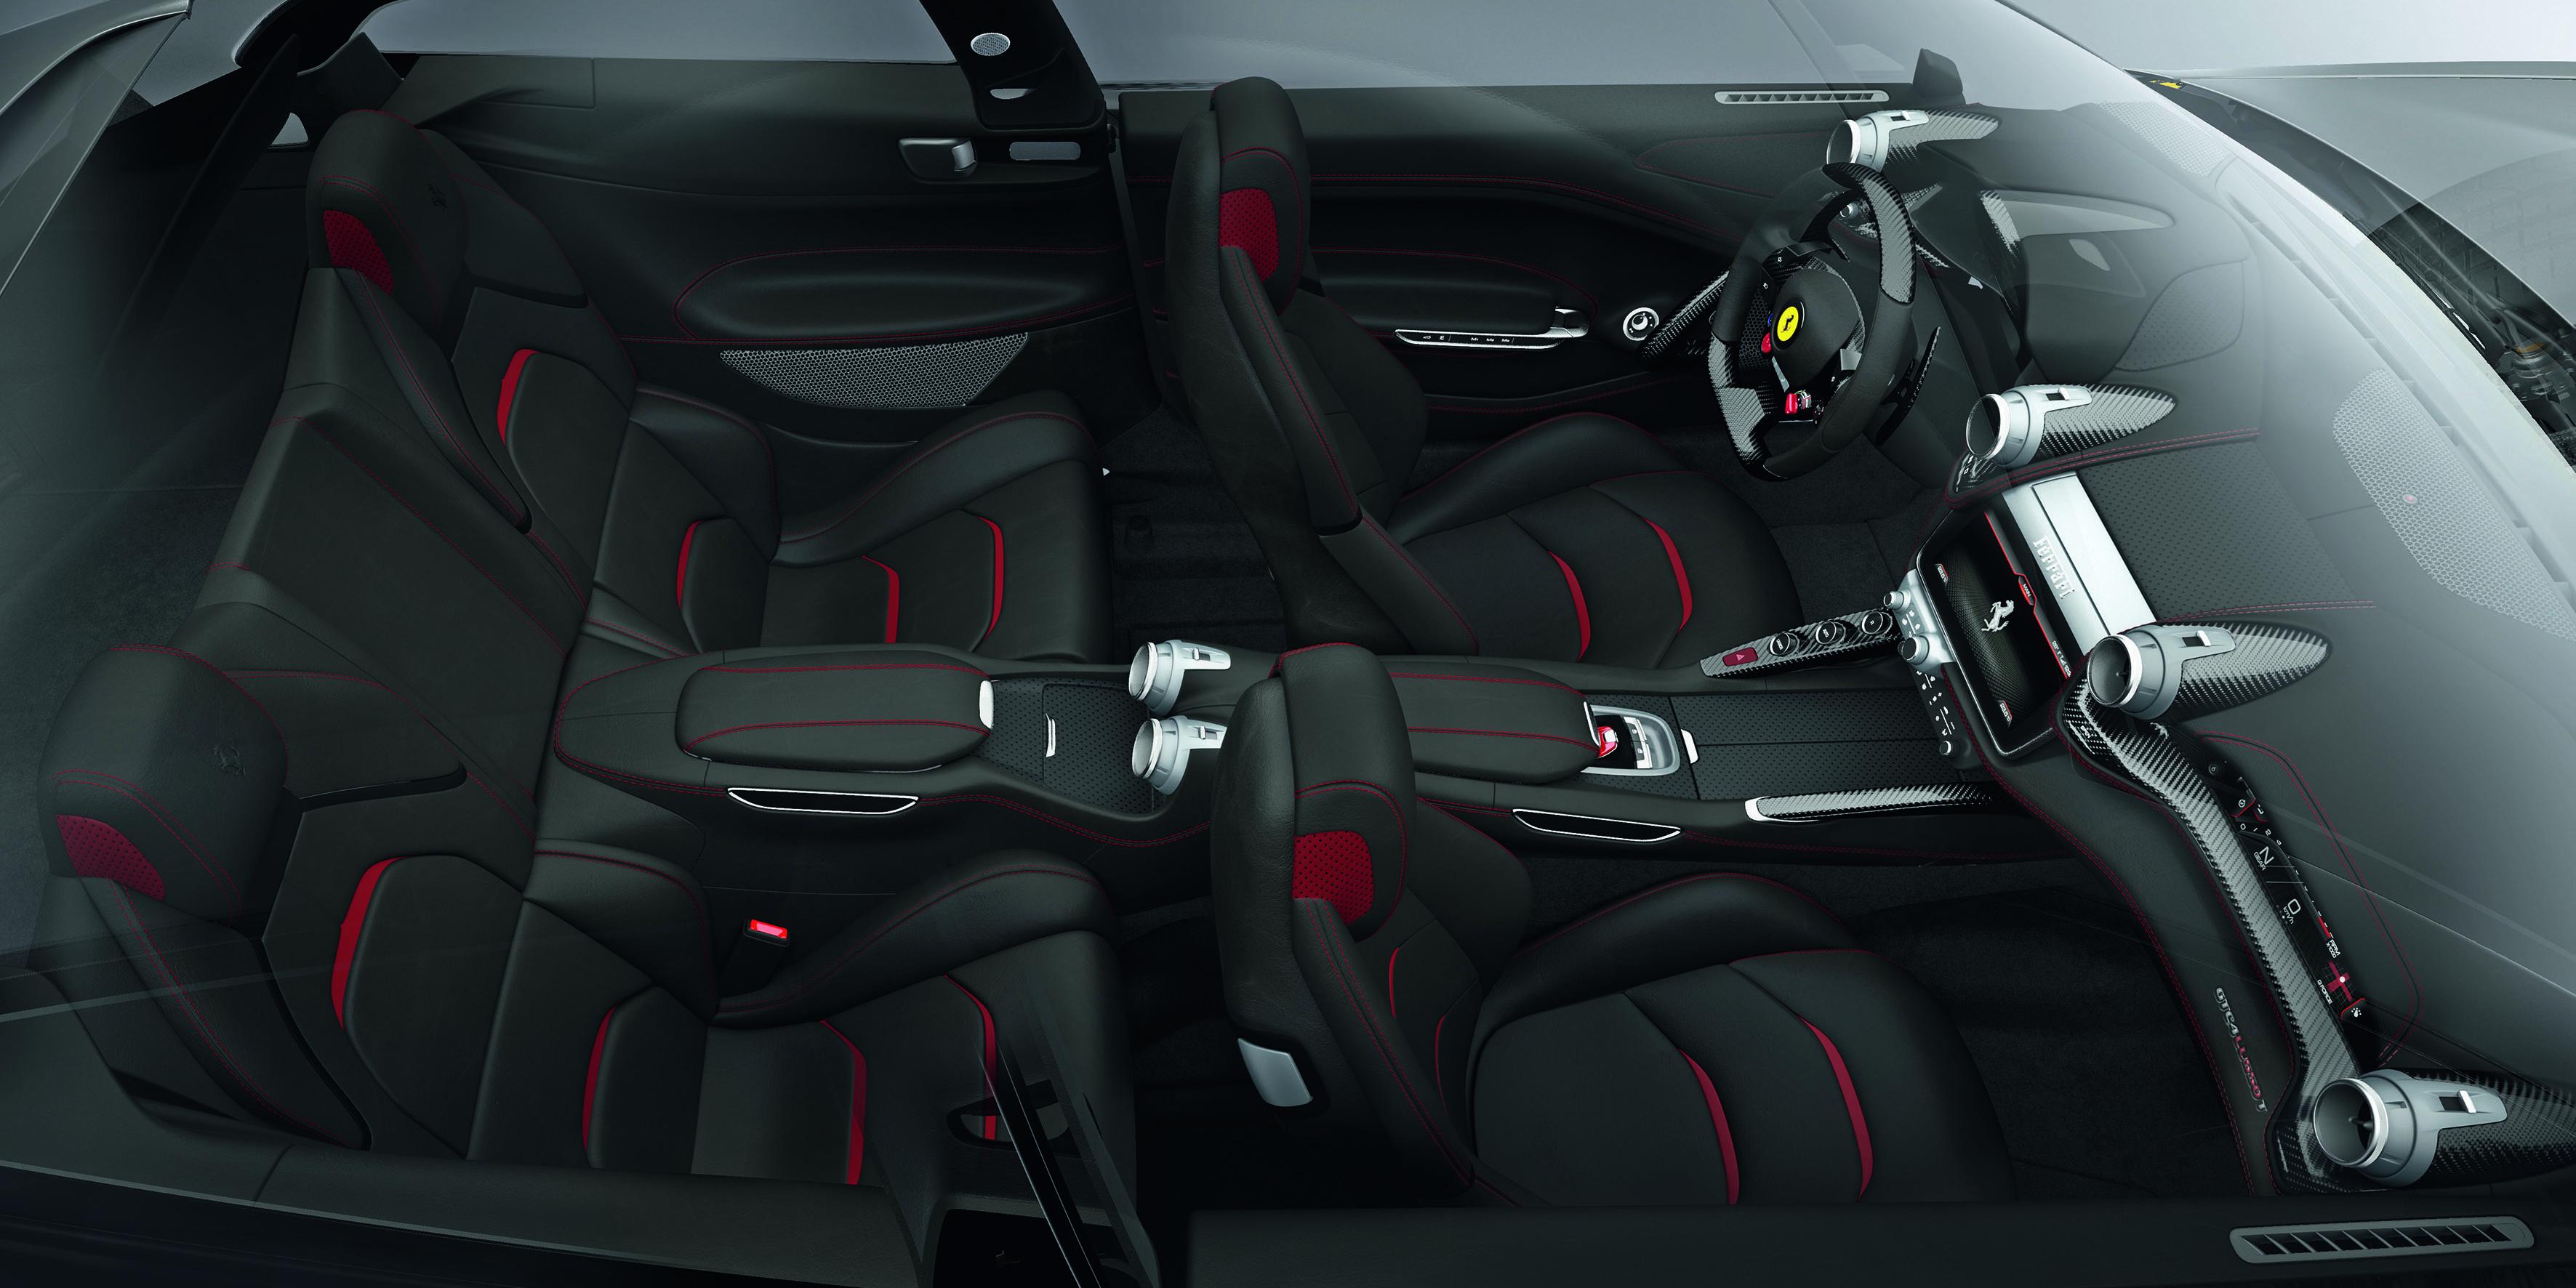 Ferrari GTC4 Lusso T debuts in Australia - photos | CarAdvice